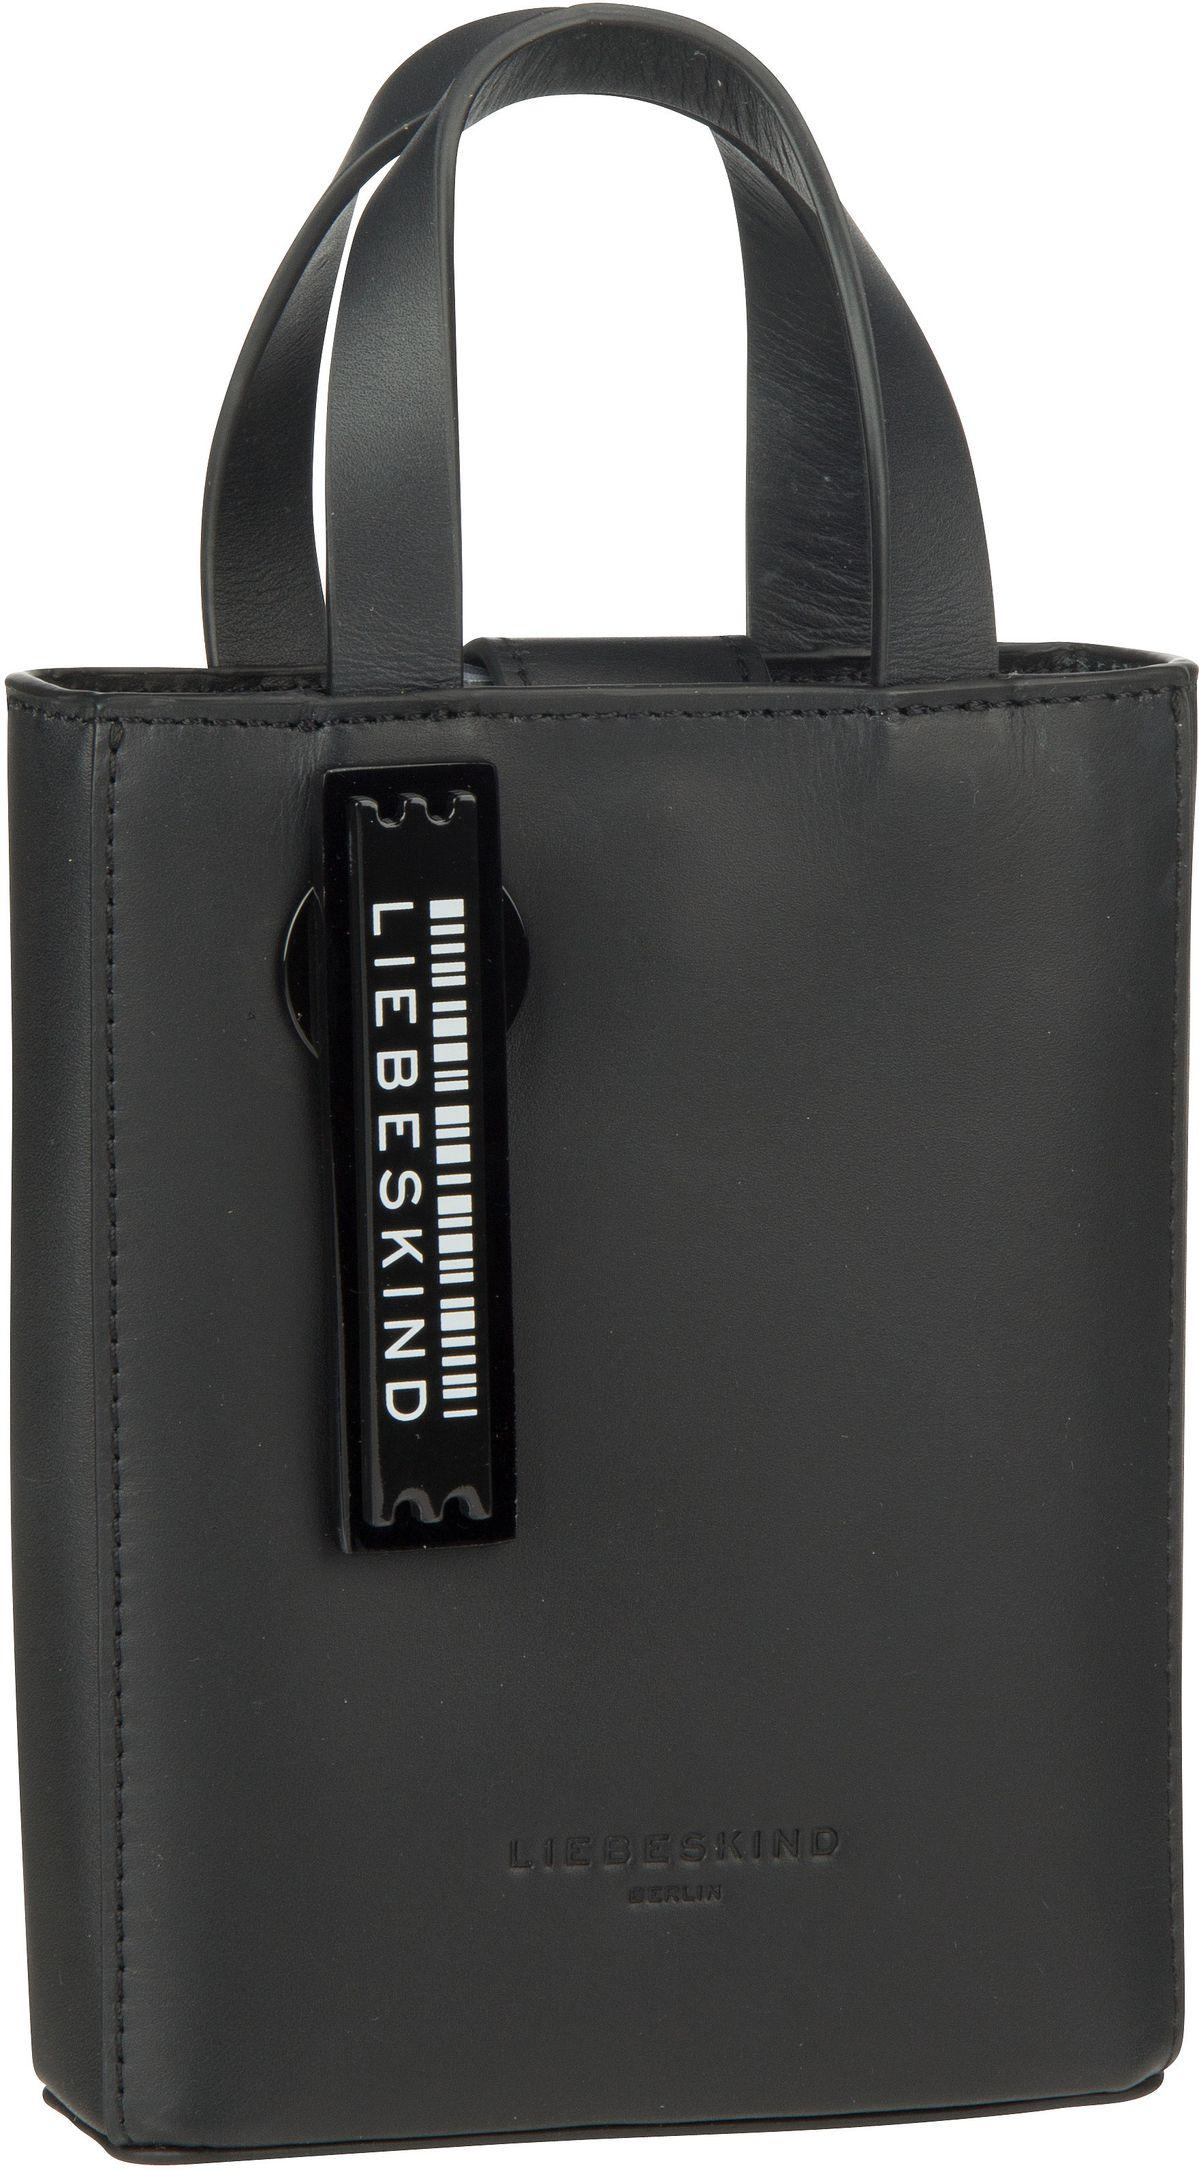 Berlin Umhängetasche Paper Bag Tote XS Black